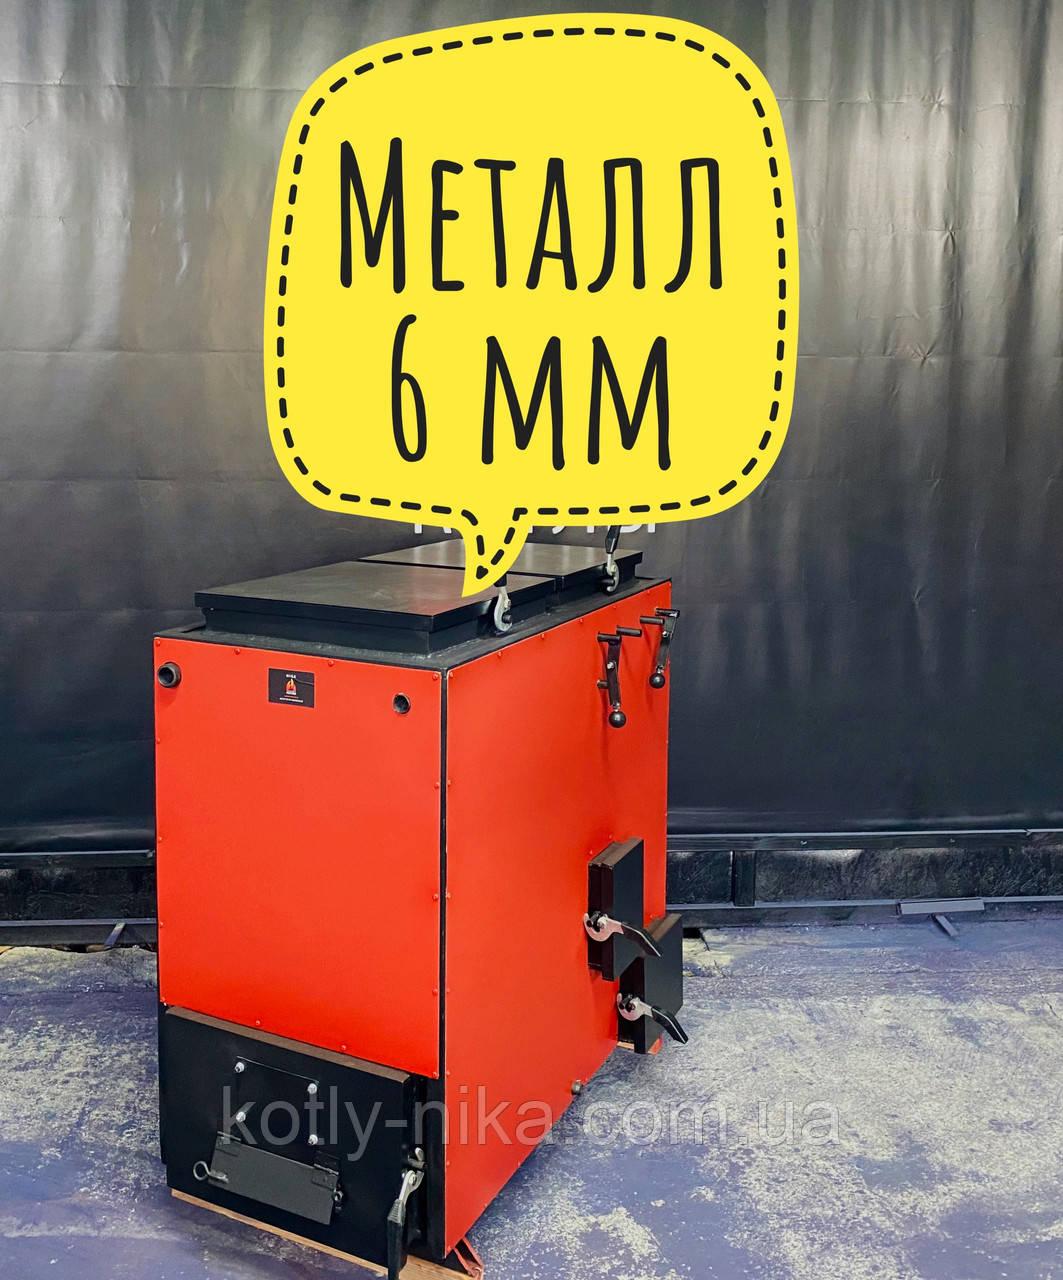 Котел Питон 20 кВт с регулировкой мощности МЕТАЛЛ 6 мм